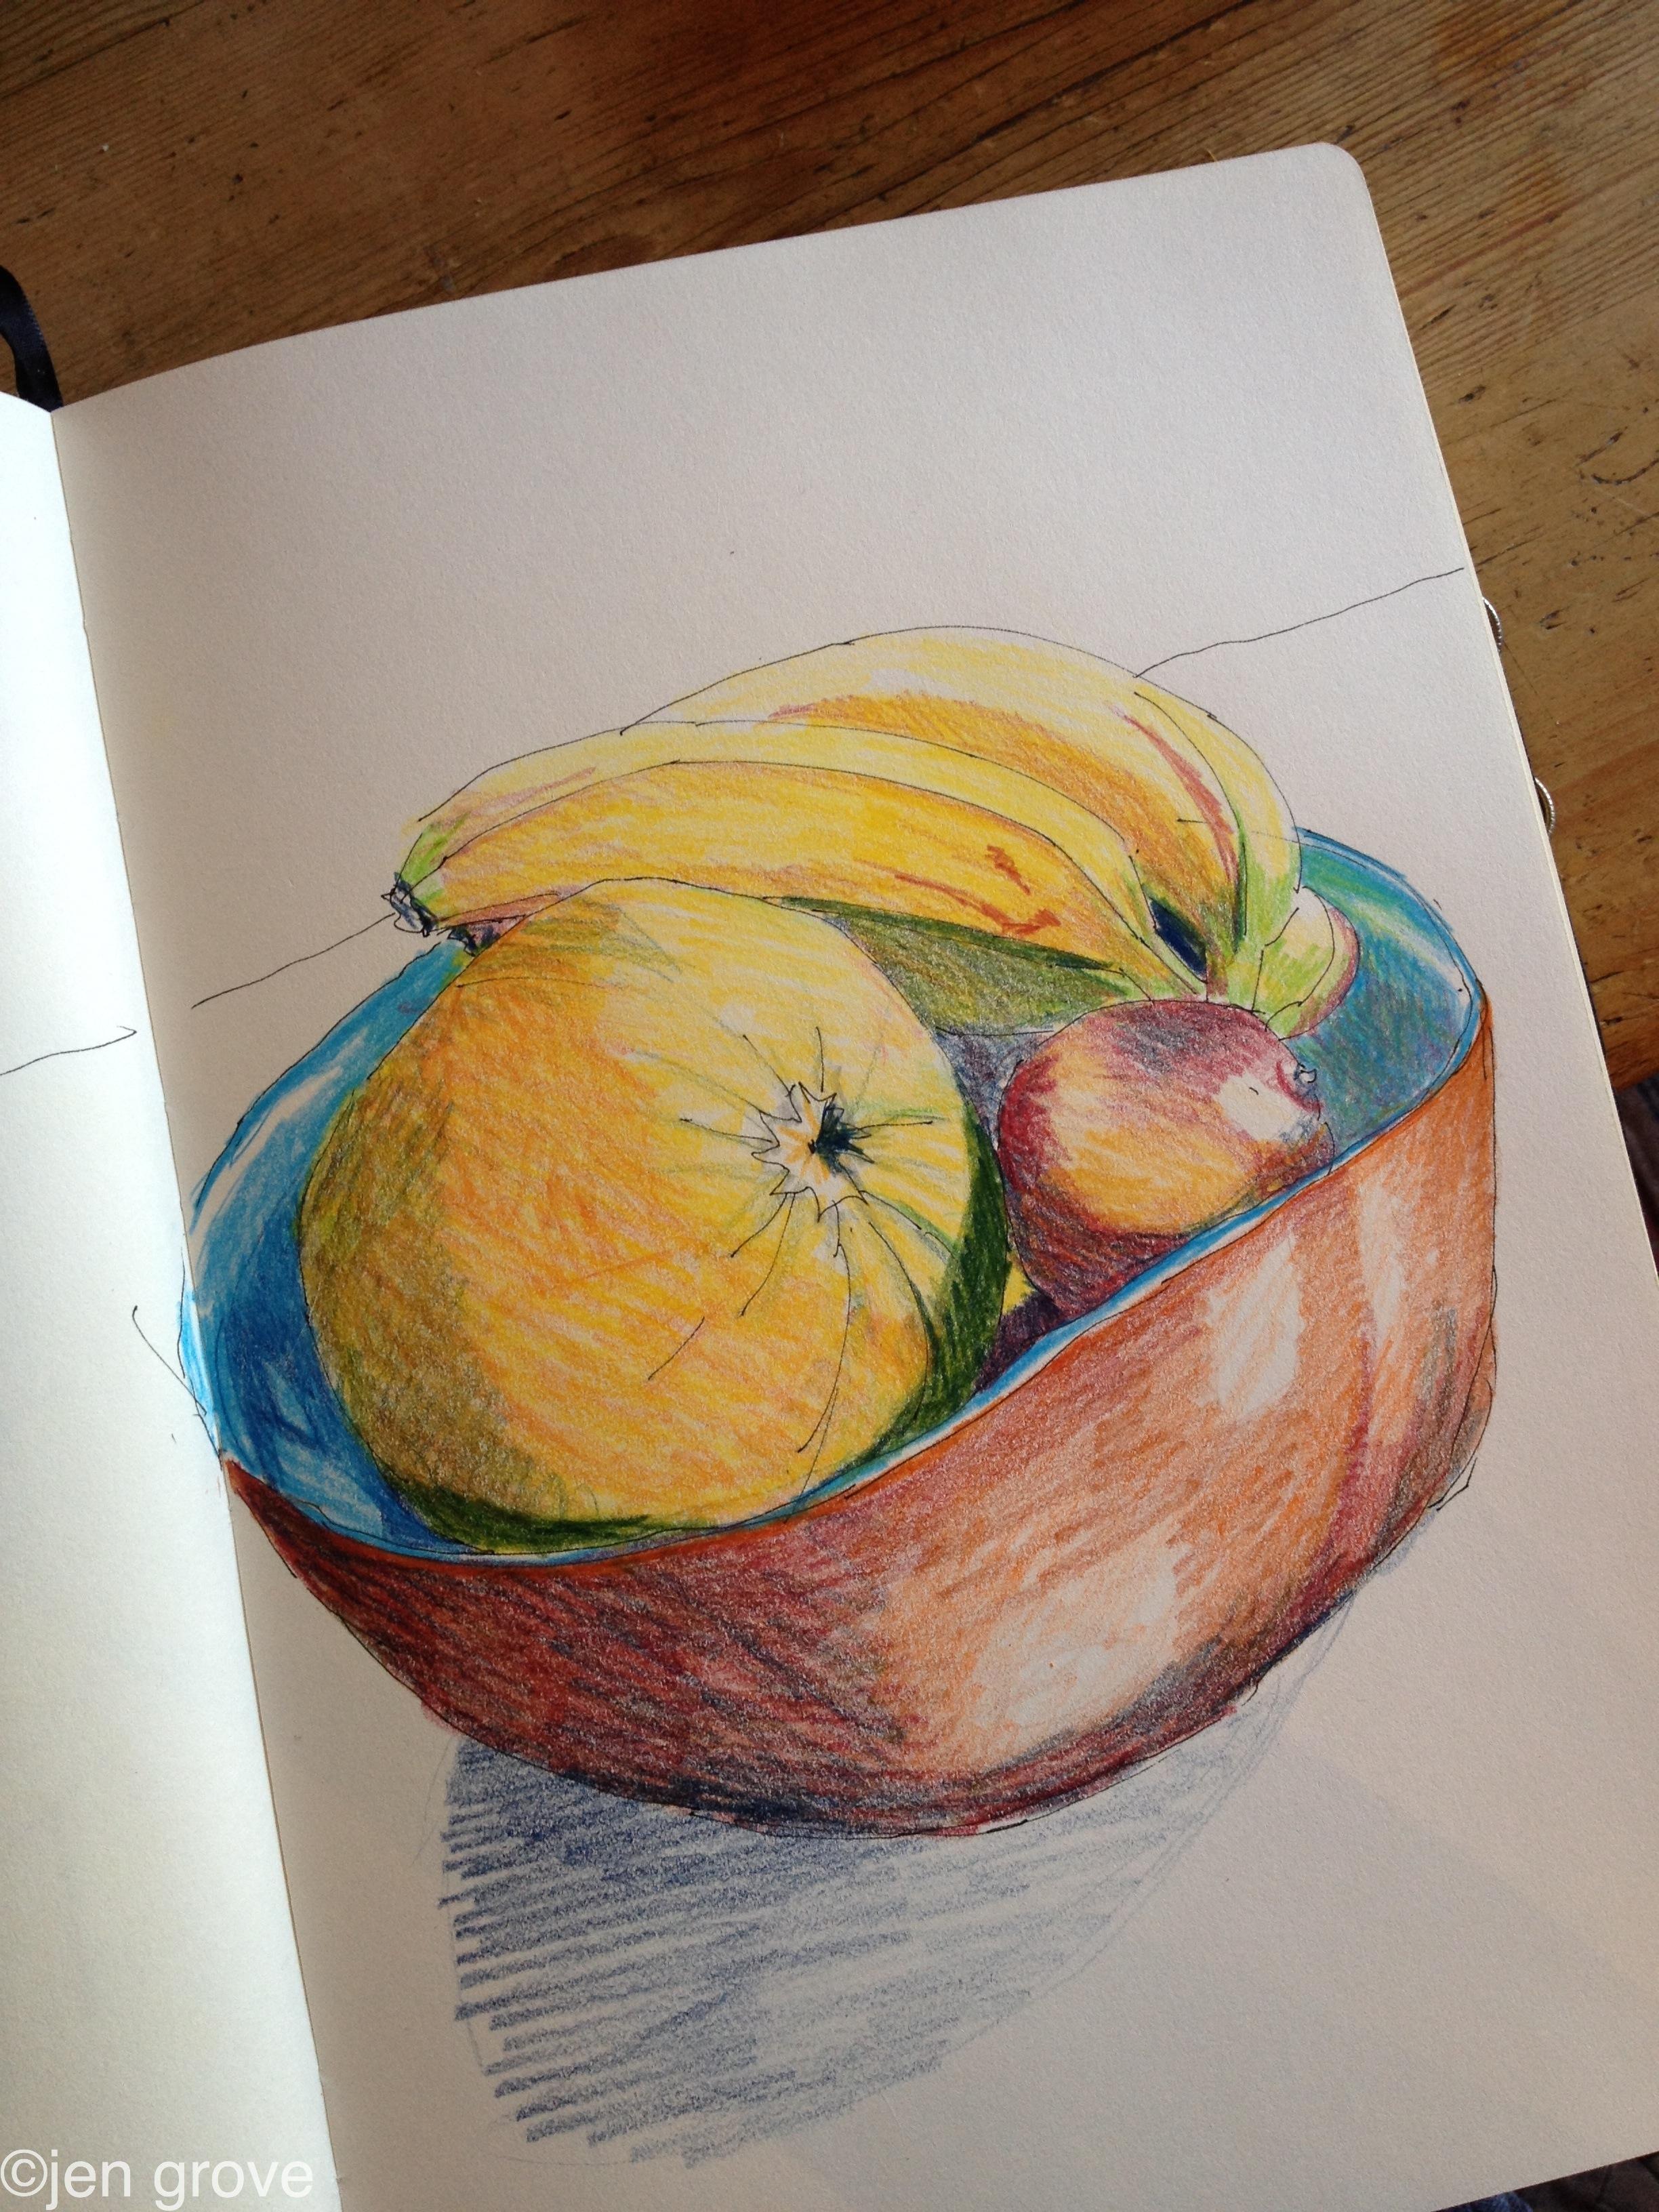 2448x3264 Fruit Bowl Colour Pencil Drawing Jensdraws